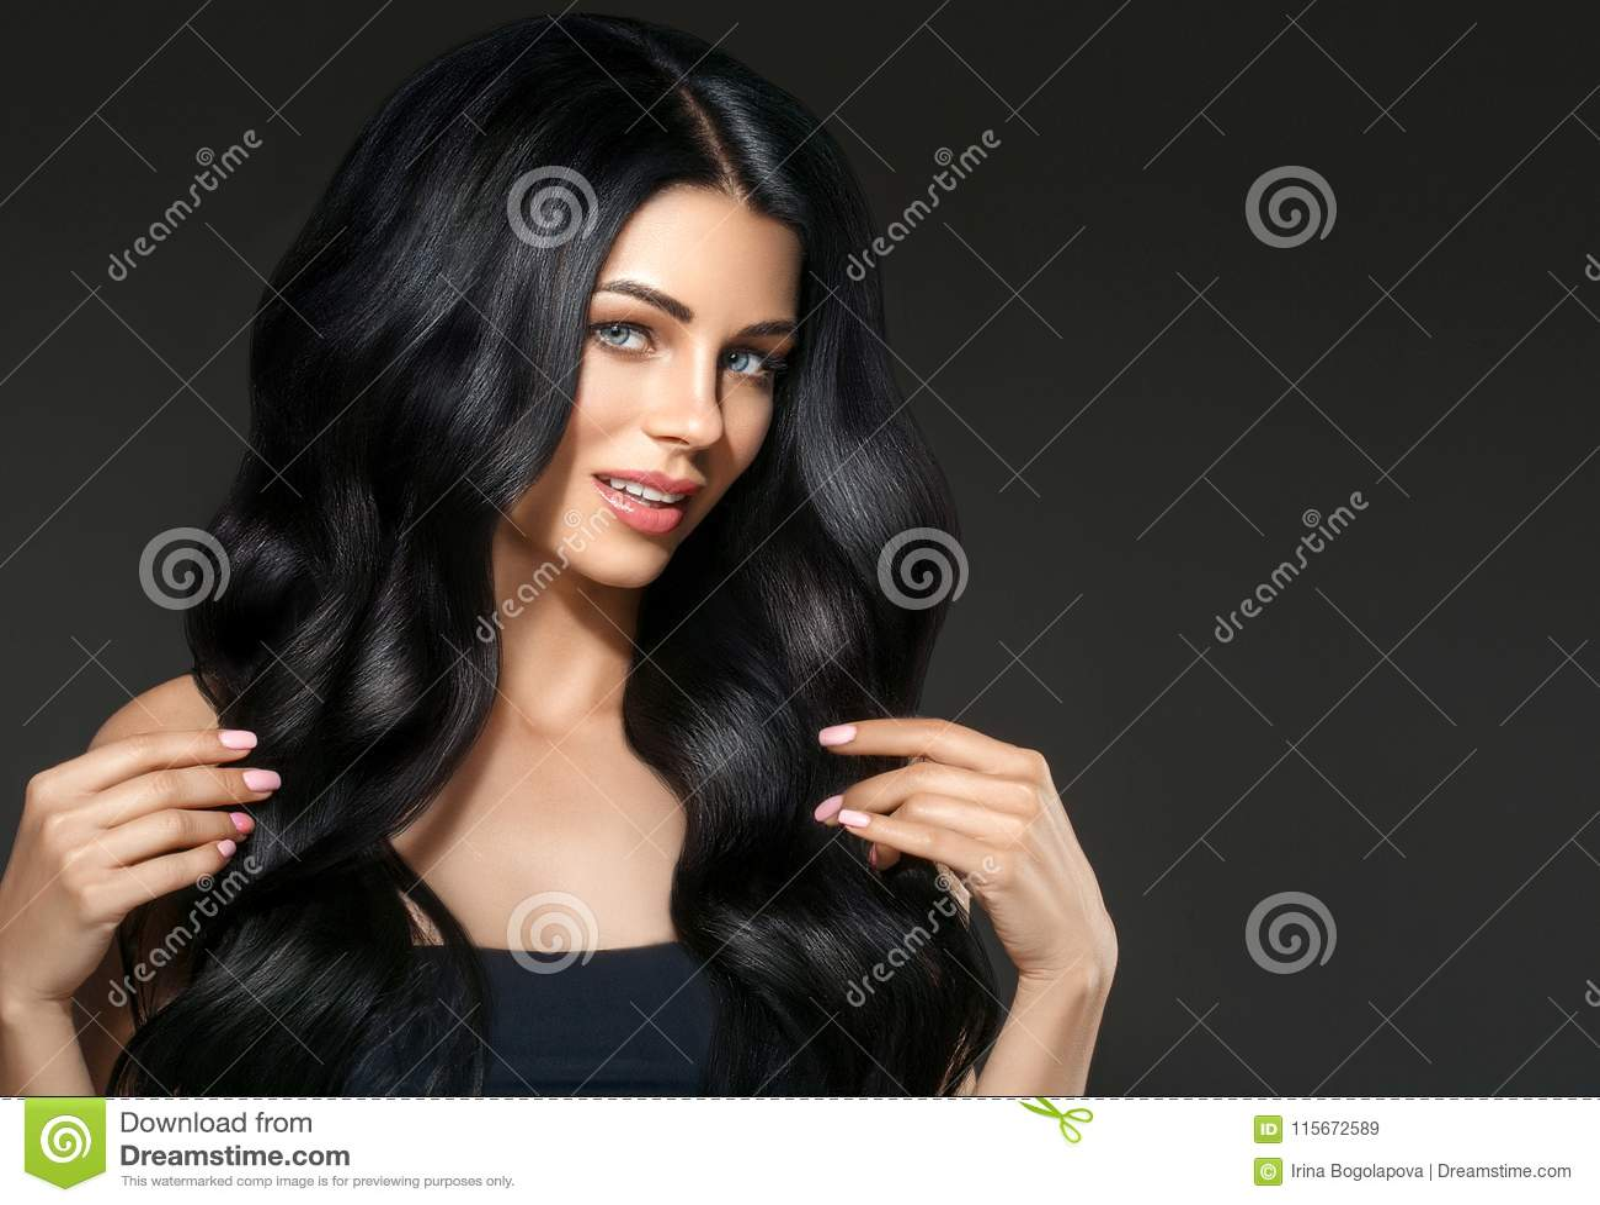 Black hair beauty woman beautiful portrait. Hairstyle curly hai